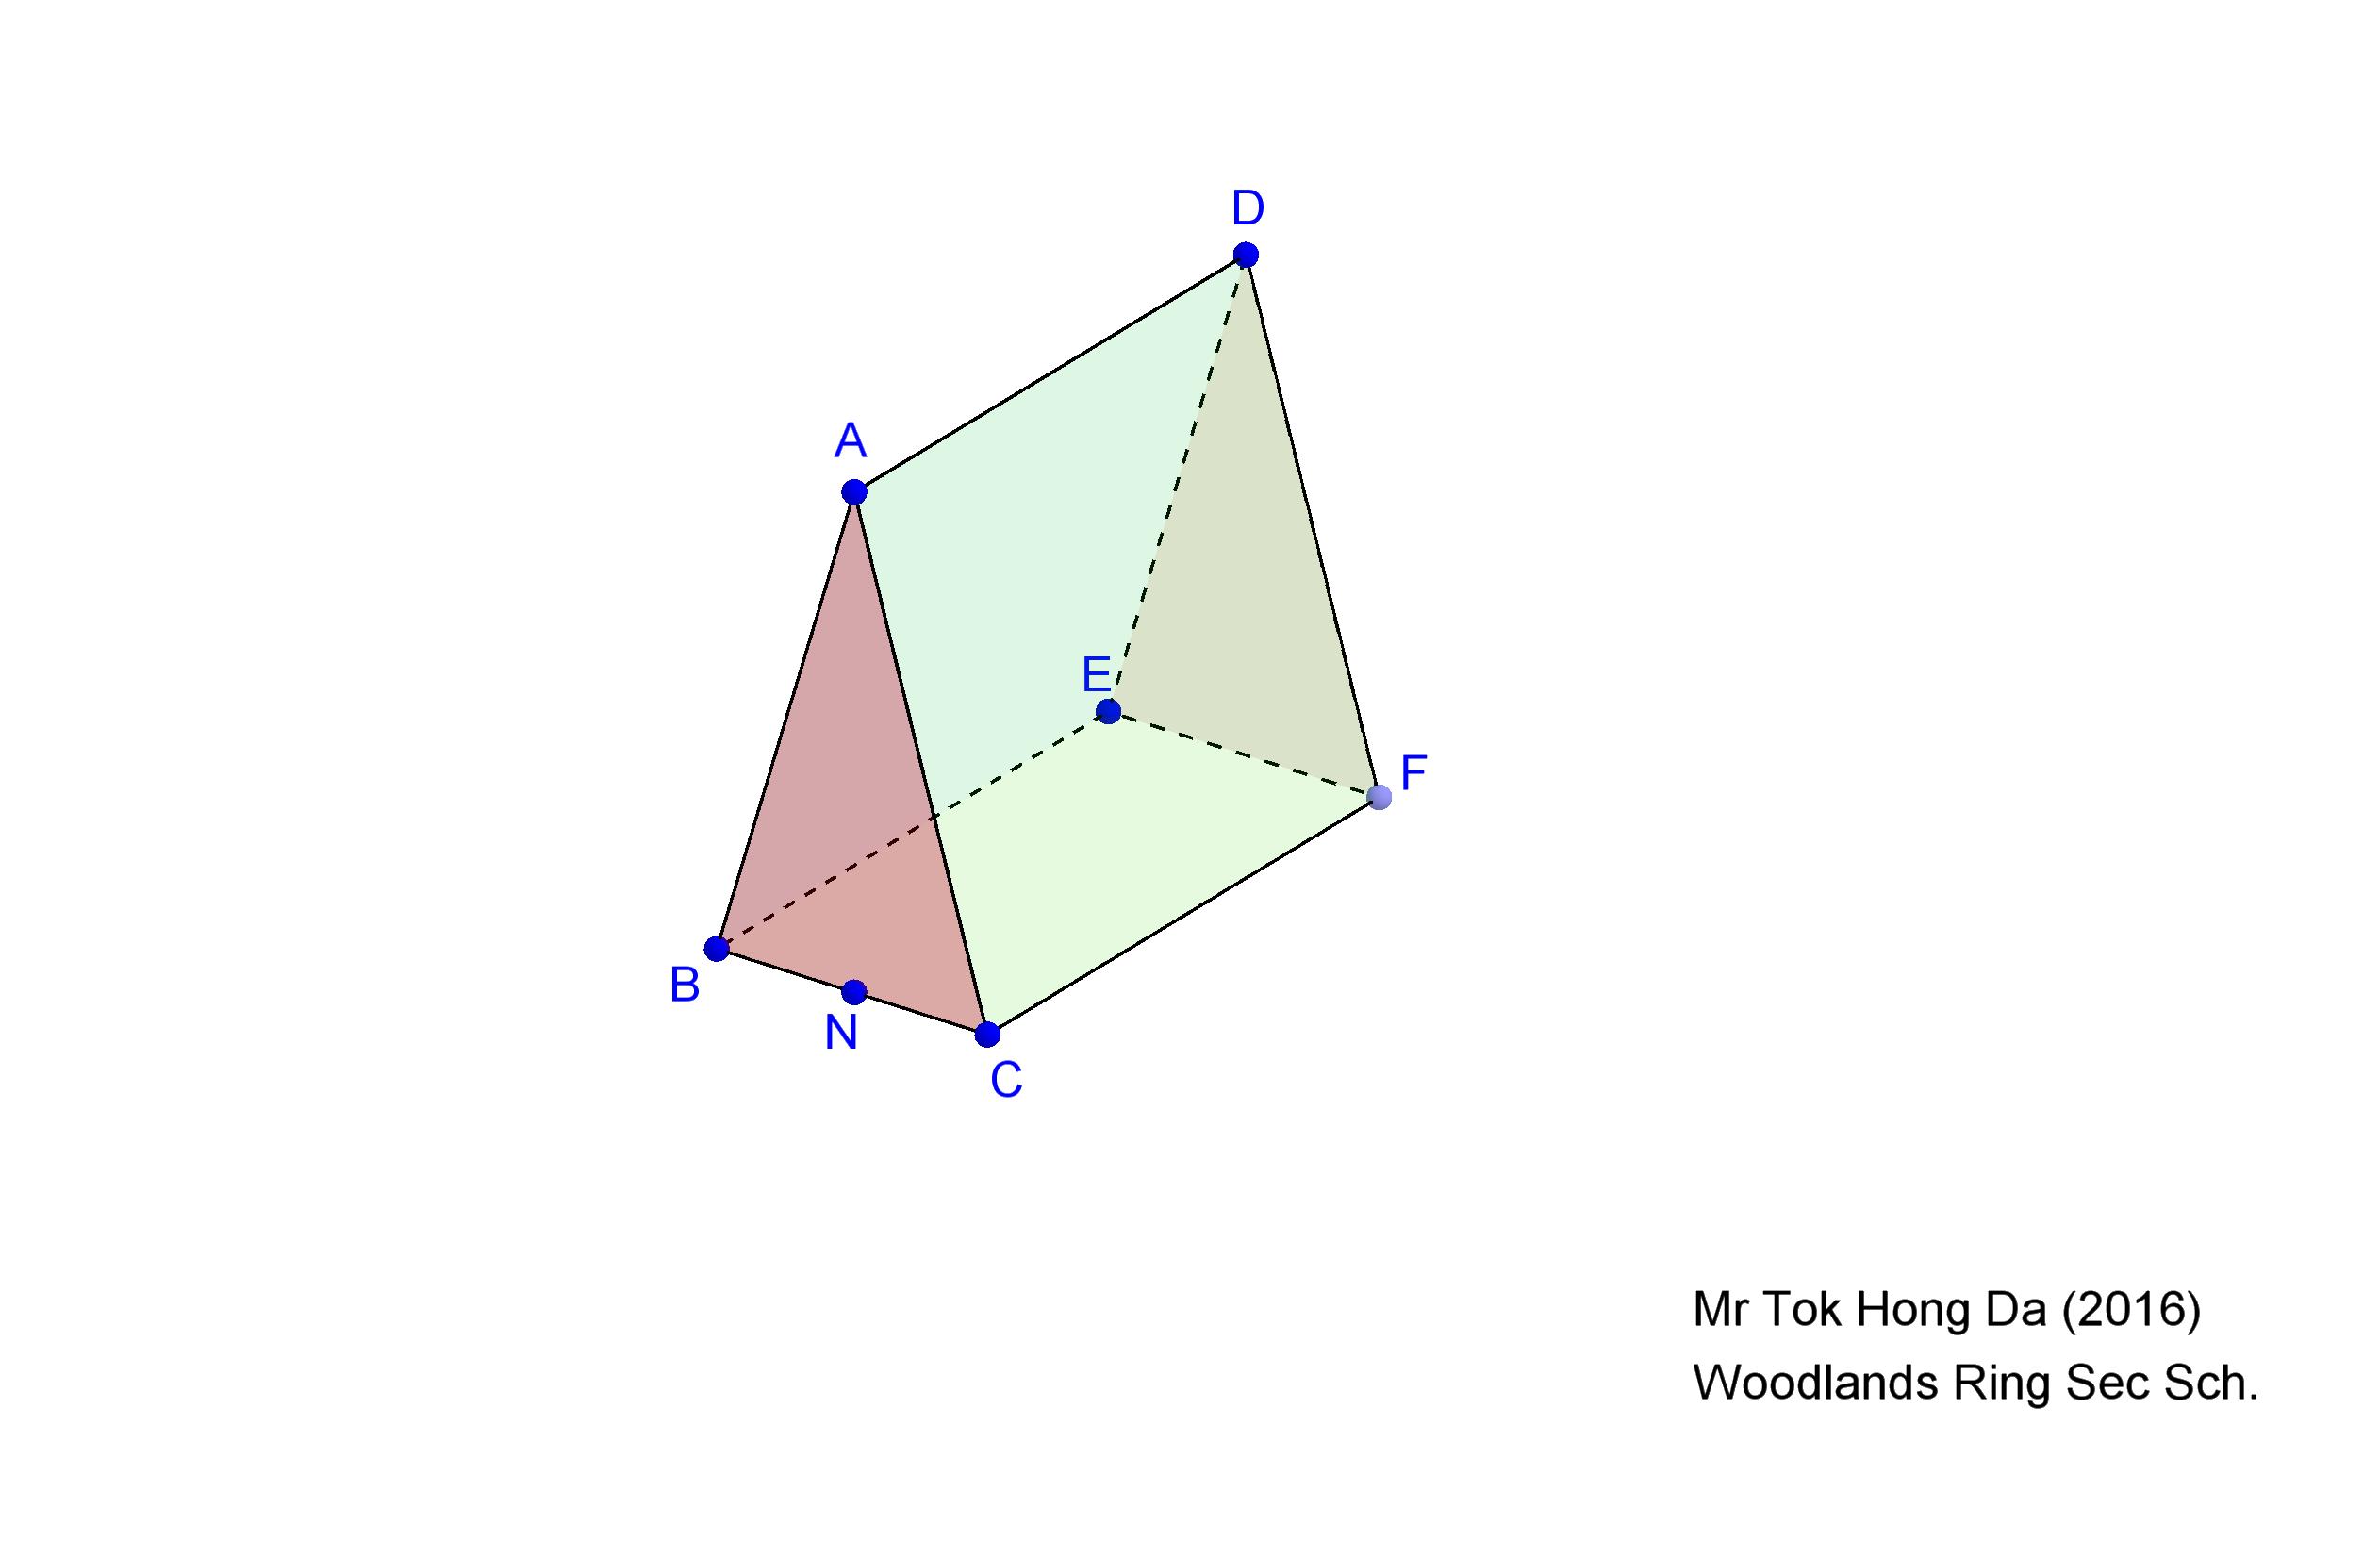 worksheet Surface Area Of A Triangular Prism Worksheet net and surface area of triangular prism geogebra view worksheet